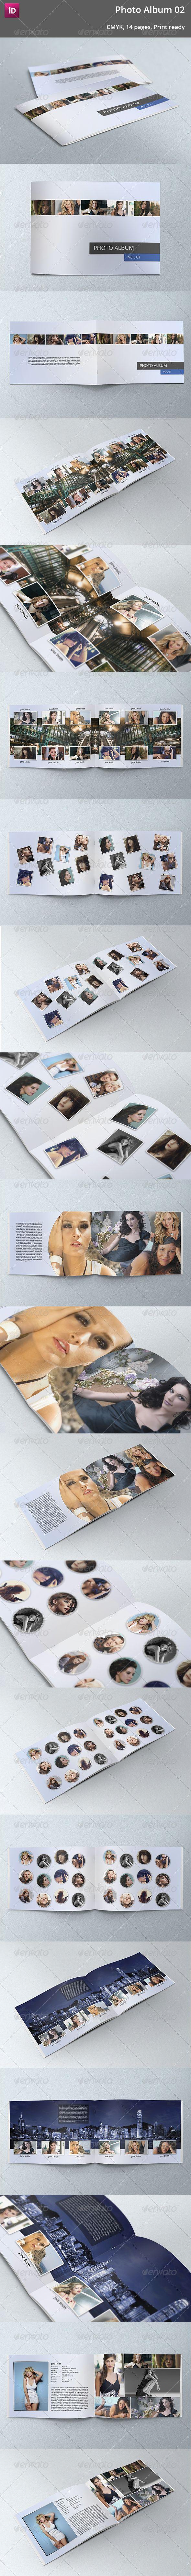 Modern Photo Album 02 - #Photo #Albums Print #Templates Download here: https://graphicriver.net/item/modern-photo-album-02/5351210?ref=alena994